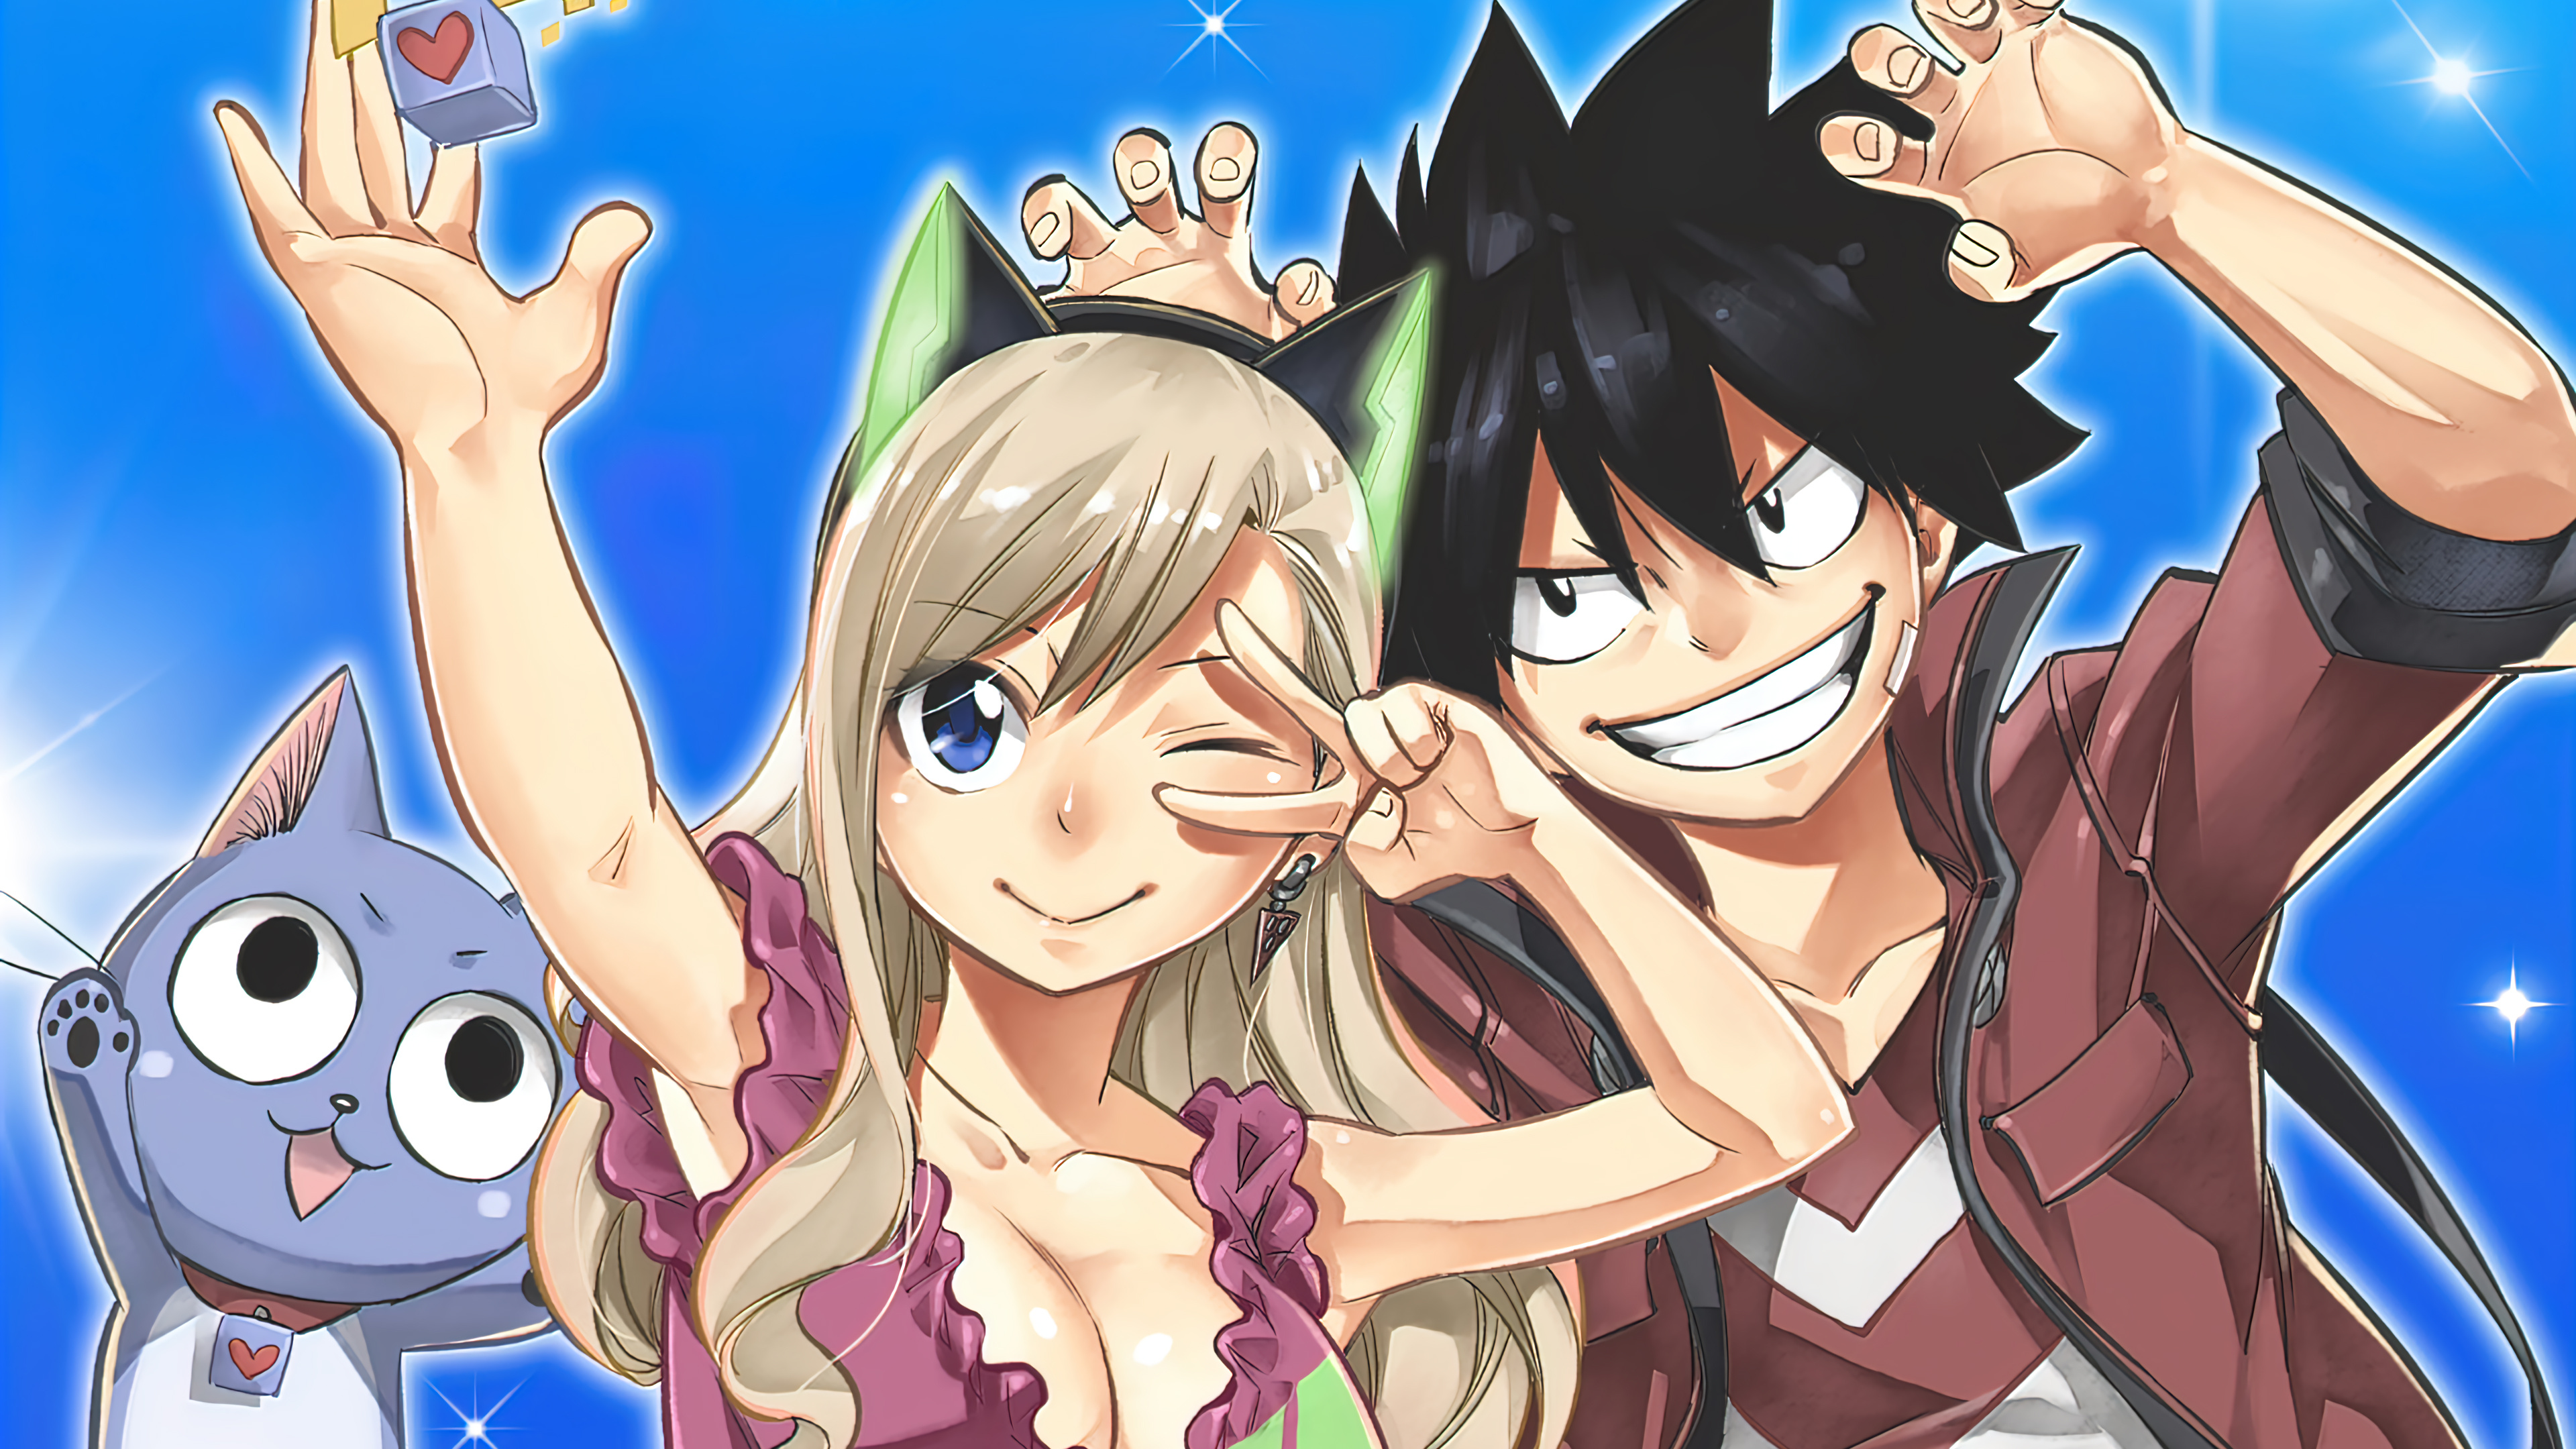 Fondos de pantalla Anime Personajes Shiki y Rebecca de Edens Zero